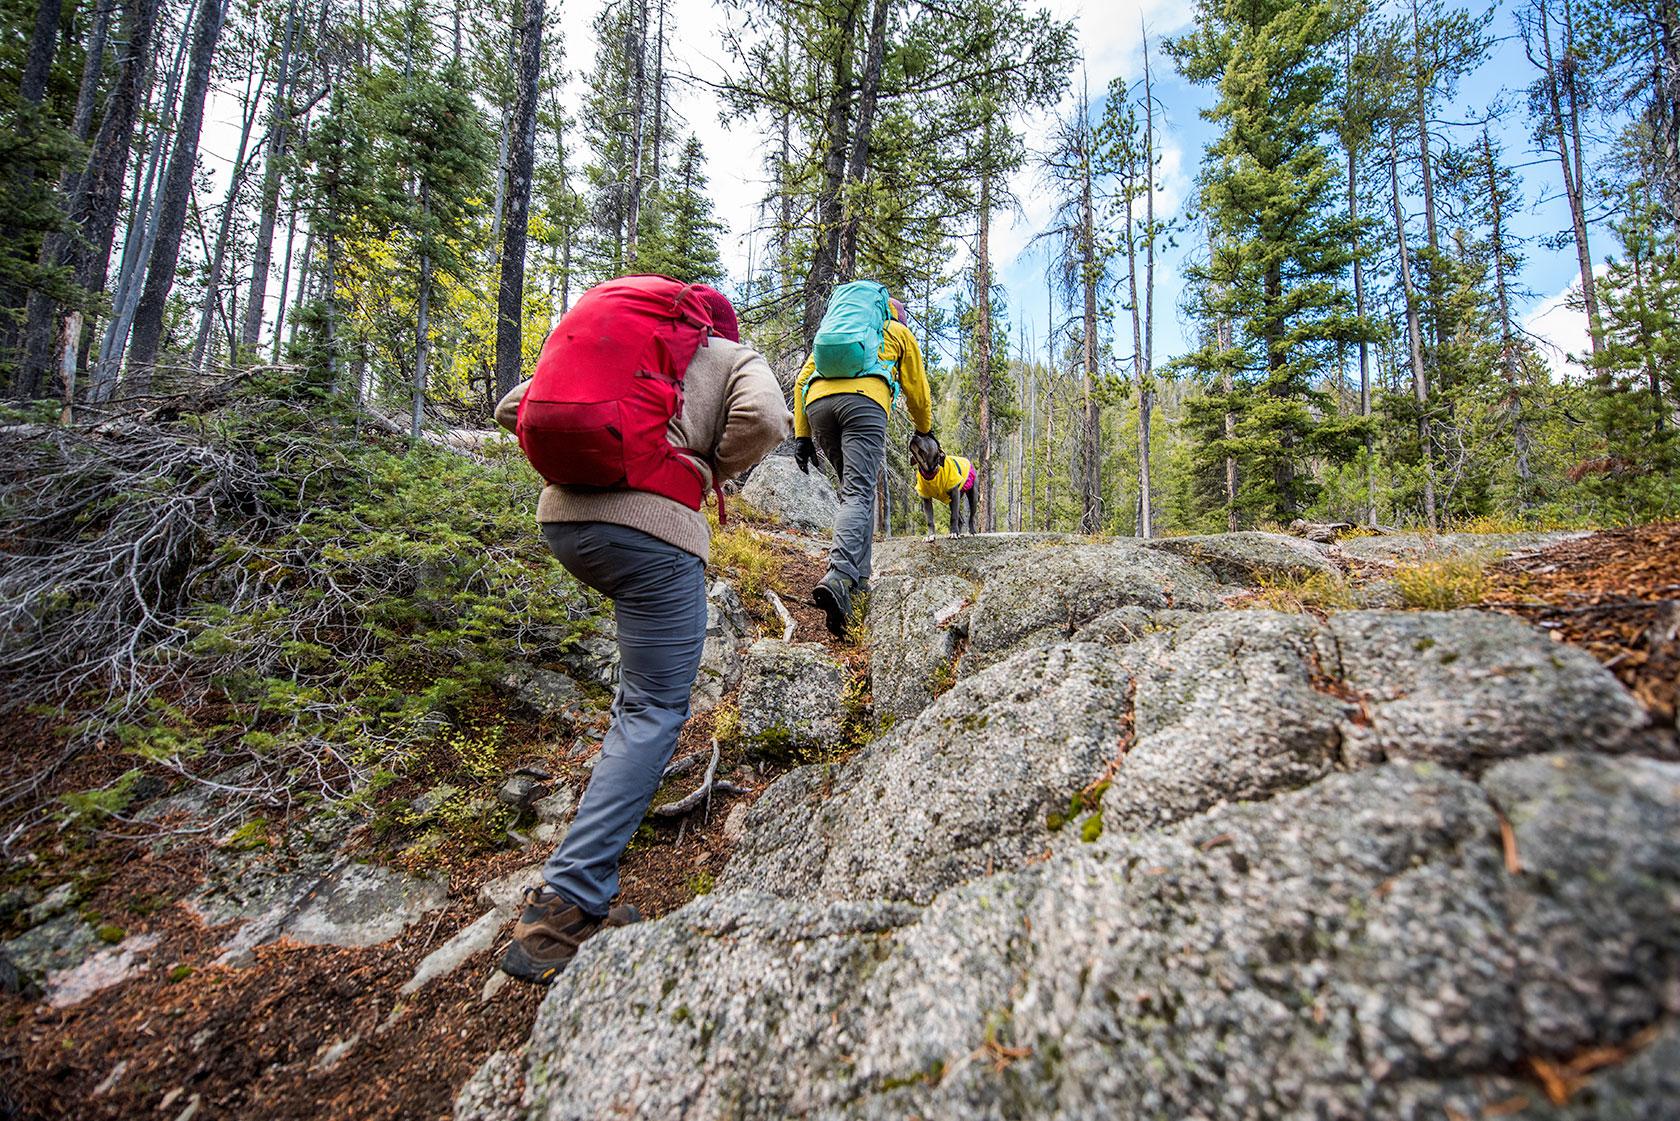 austin-trigg-patagonia-sawtooth-hiking-advenure-wilderness-forest-idaho-outside-lifestyle-day-fall-weather-mountains-bushwhack.jpg